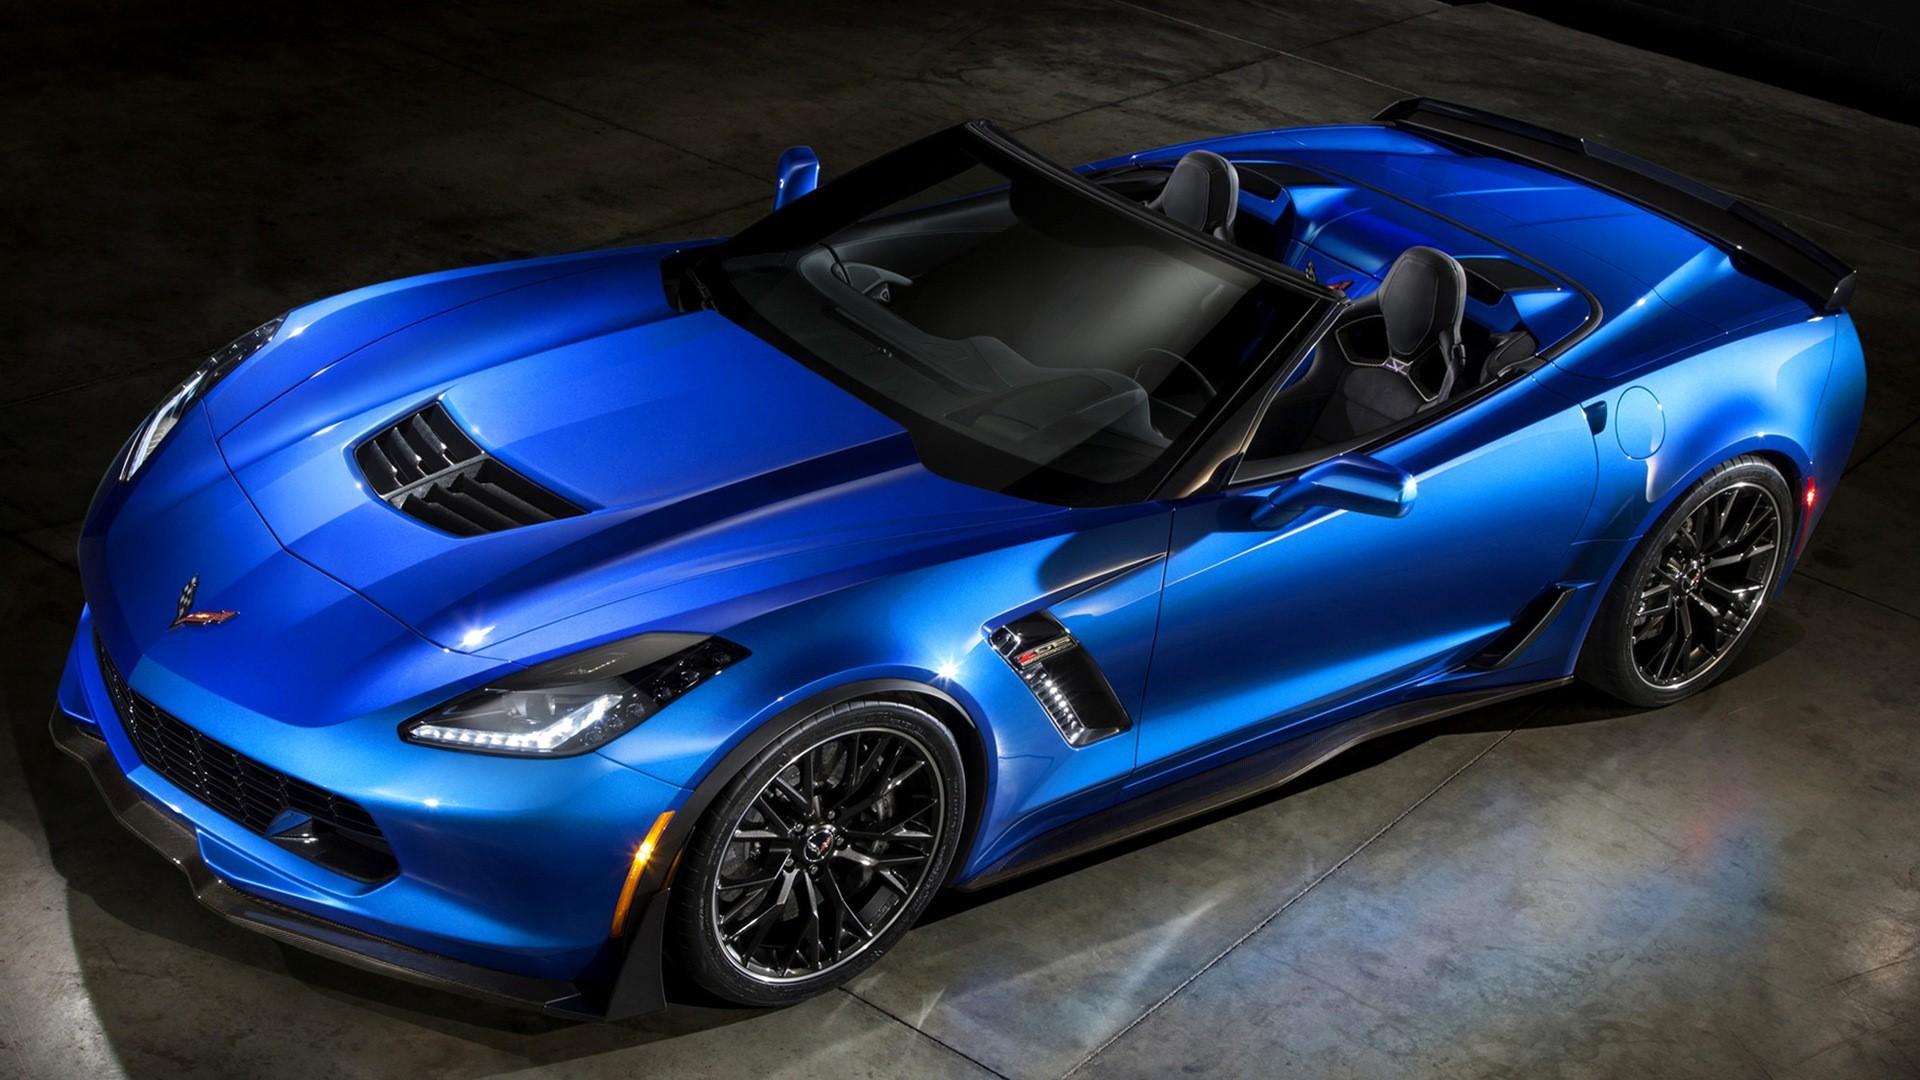 Res: 1920x1080, New Chevrolet Corvette Z06 Convertible Blue Car HD Wallpapers